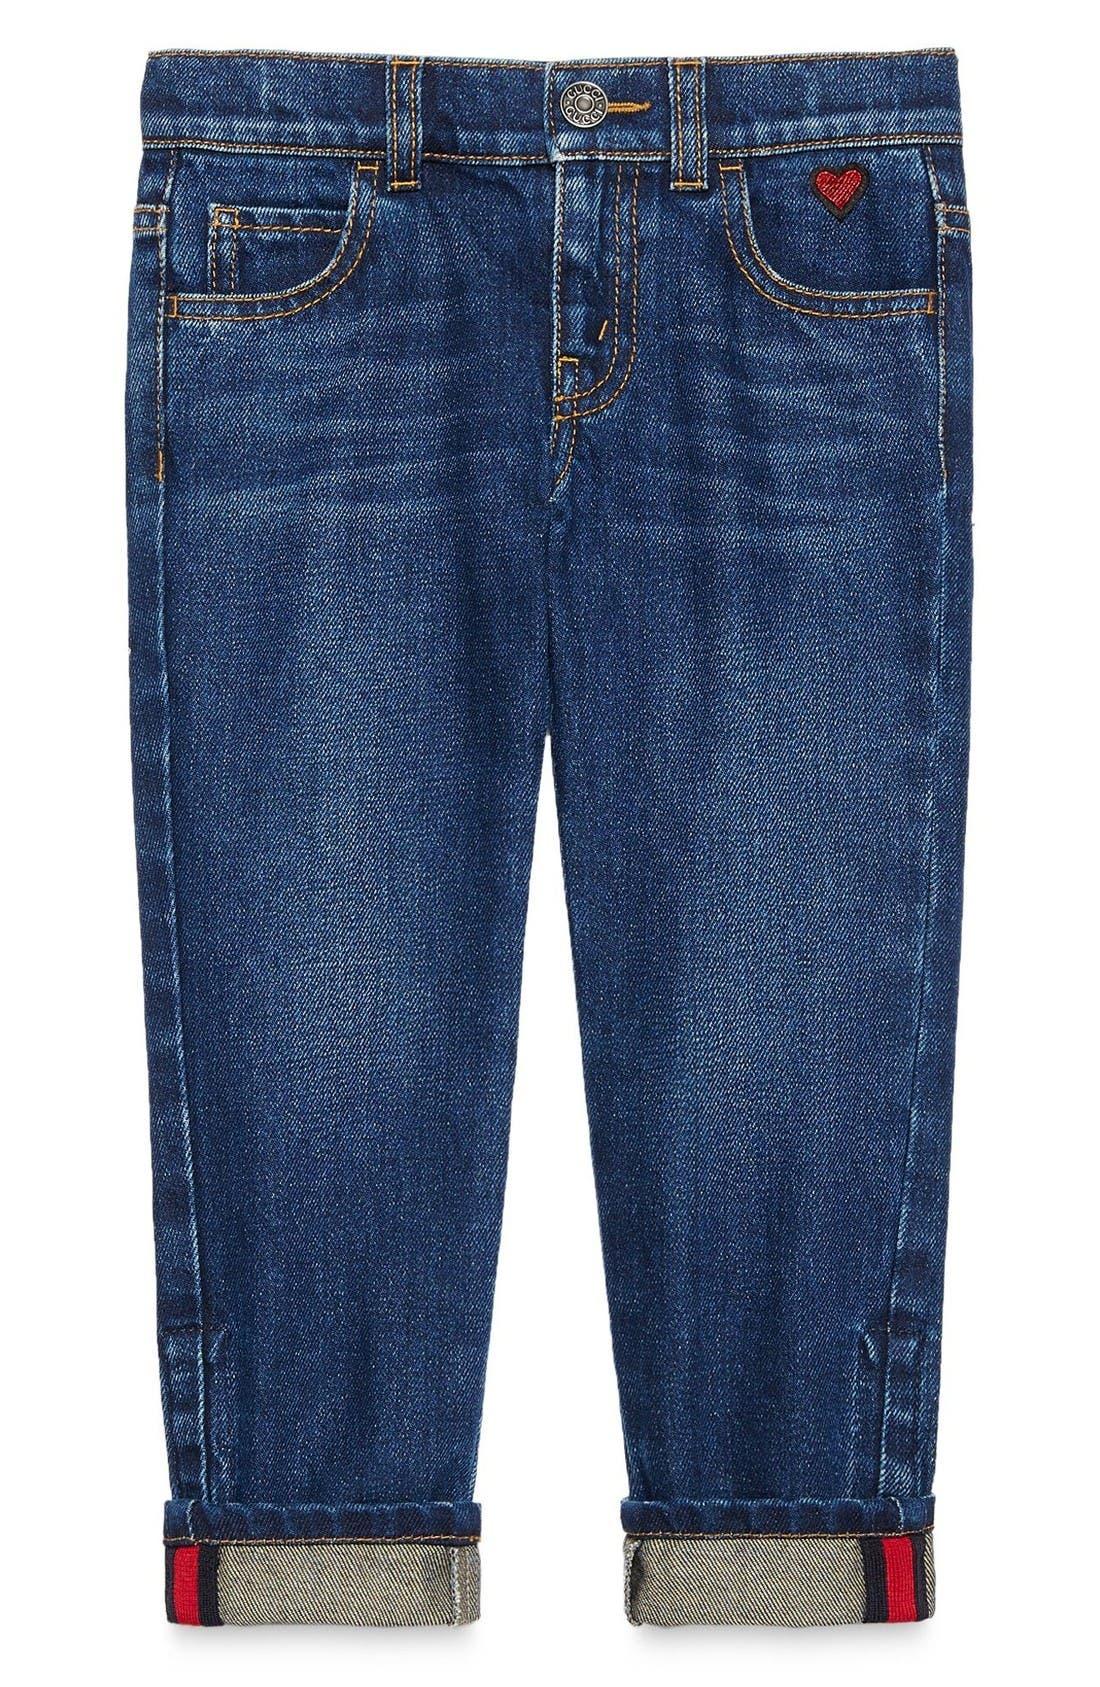 Main Image - Gucci Cuffed Jeans (Little Girls & Big Girls)